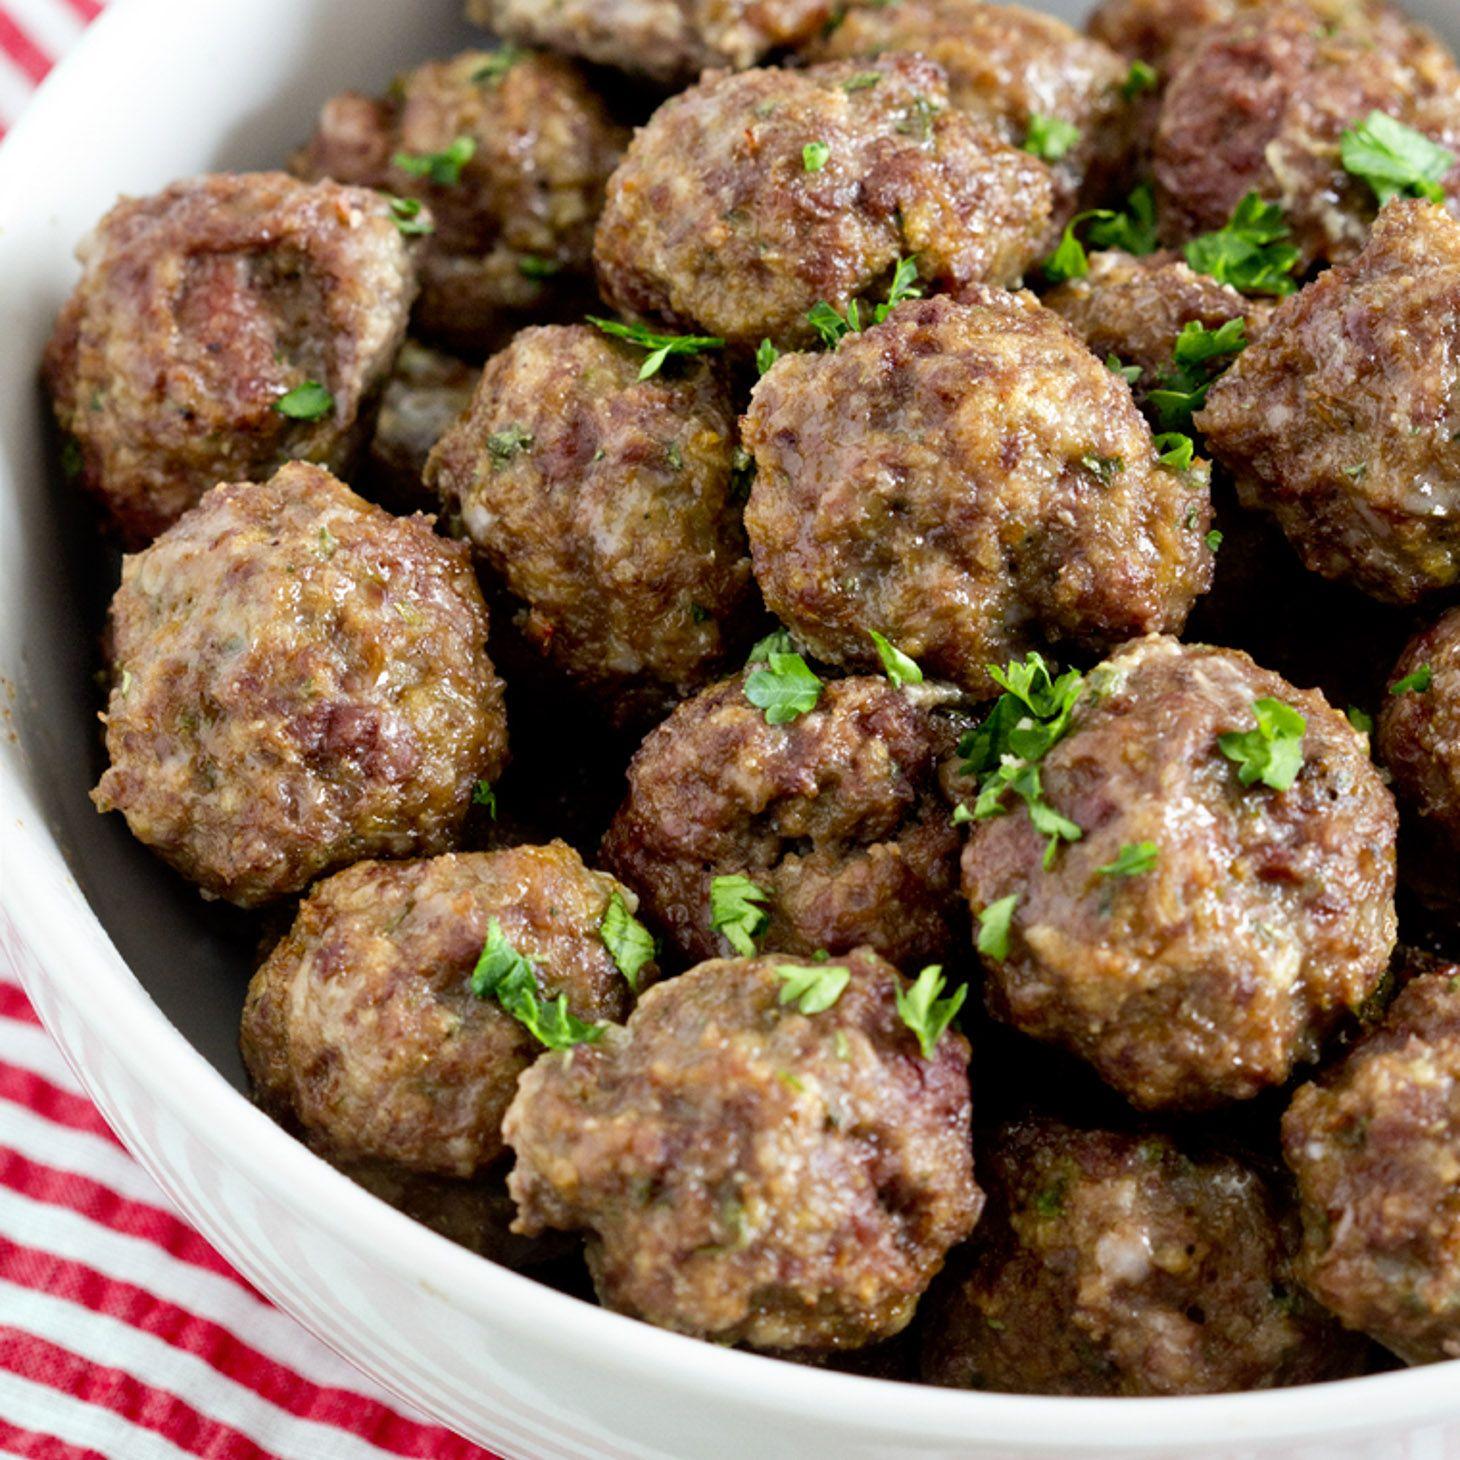 Easy Meatball Recipe Step By Step Video Lil Luna Recipe Homemade Meatballs Recipe Homemade Meatballs Easy Homemade Meatballs